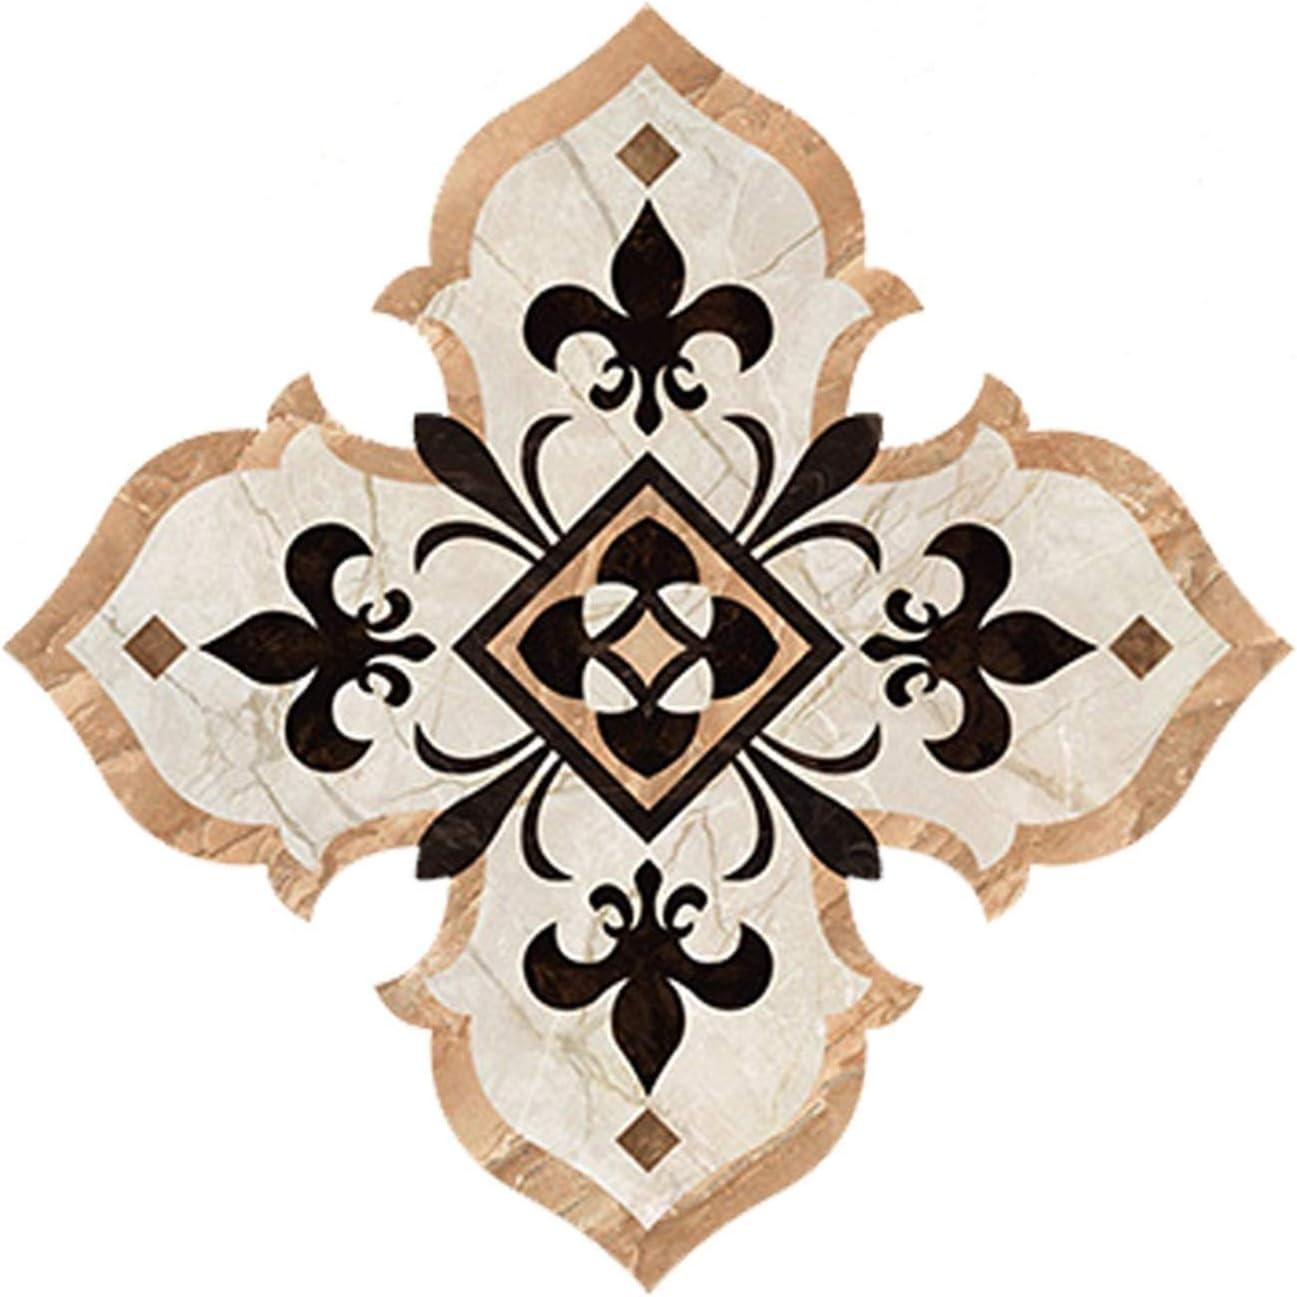 Amazon Com Jucaiyuan 21 Pcs Smooth Floor Sticker Backsplash Applique Pvc Waterproof Diagonal Stickers Home Ceramic Tile Decal For Kitchen Bathroom Color O Home Kitchen